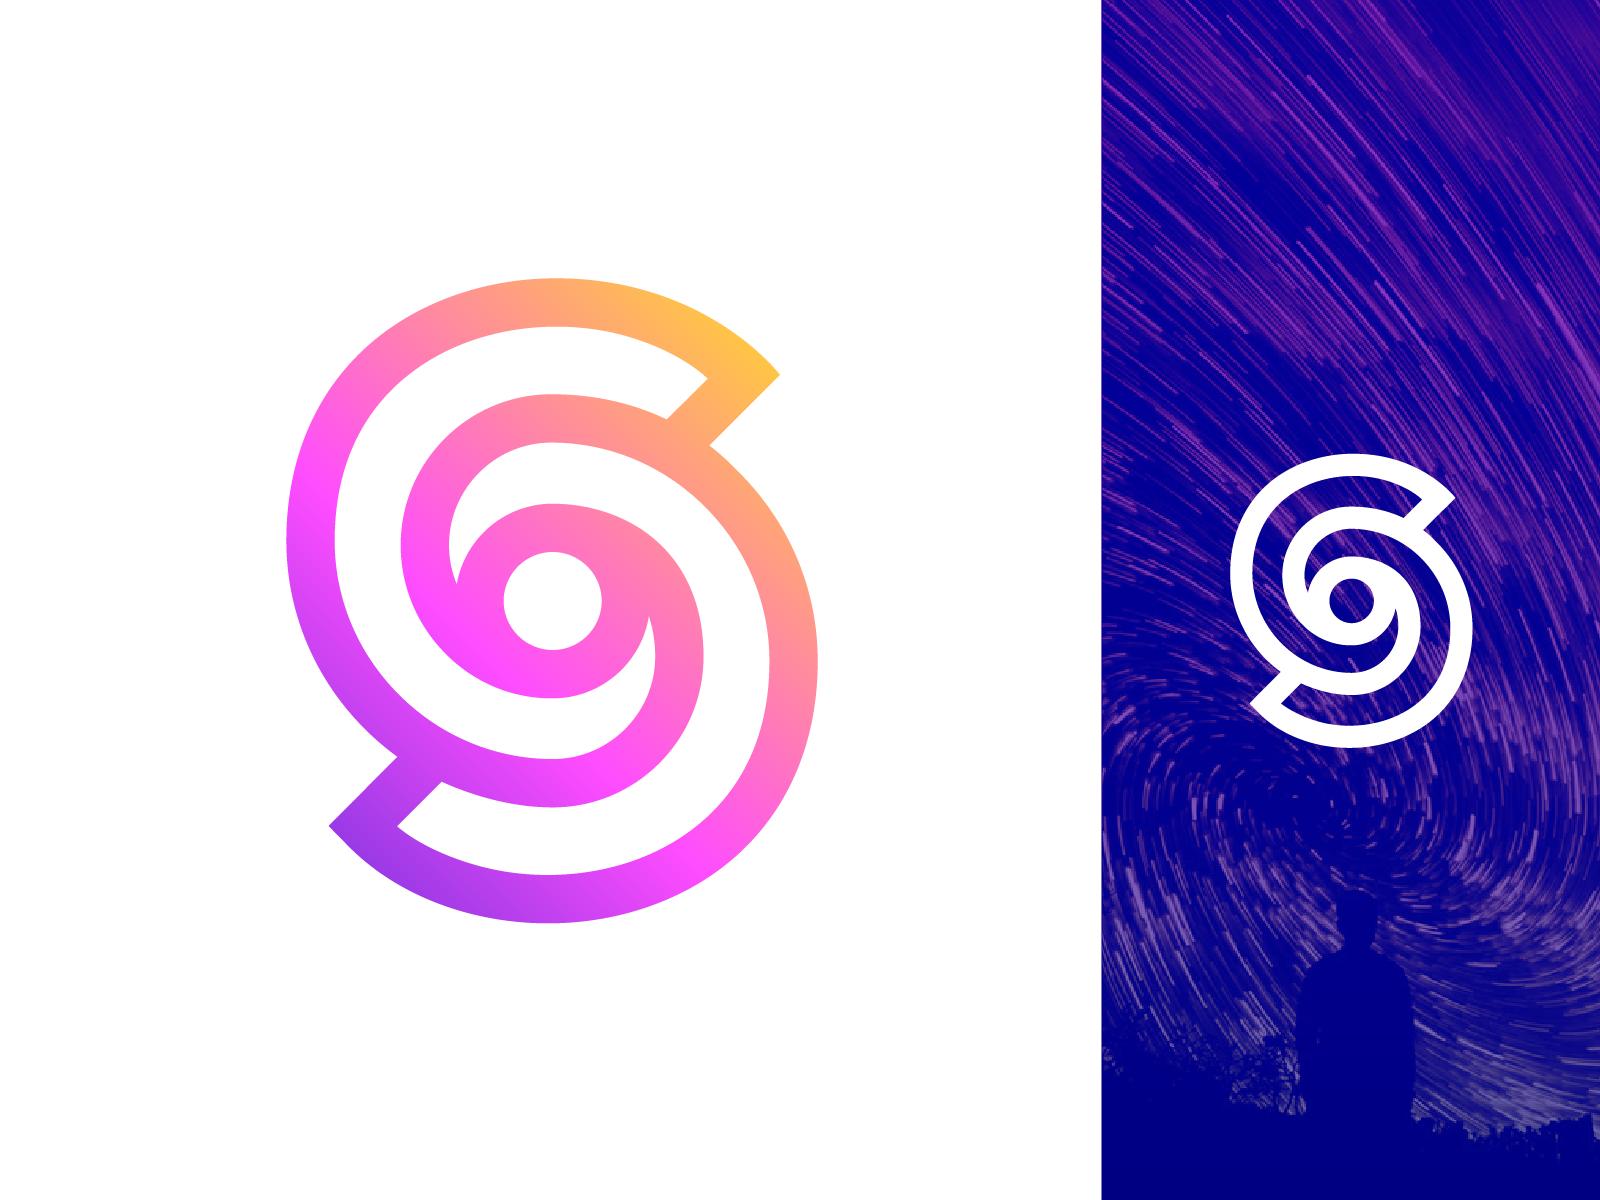 S for swirl 04